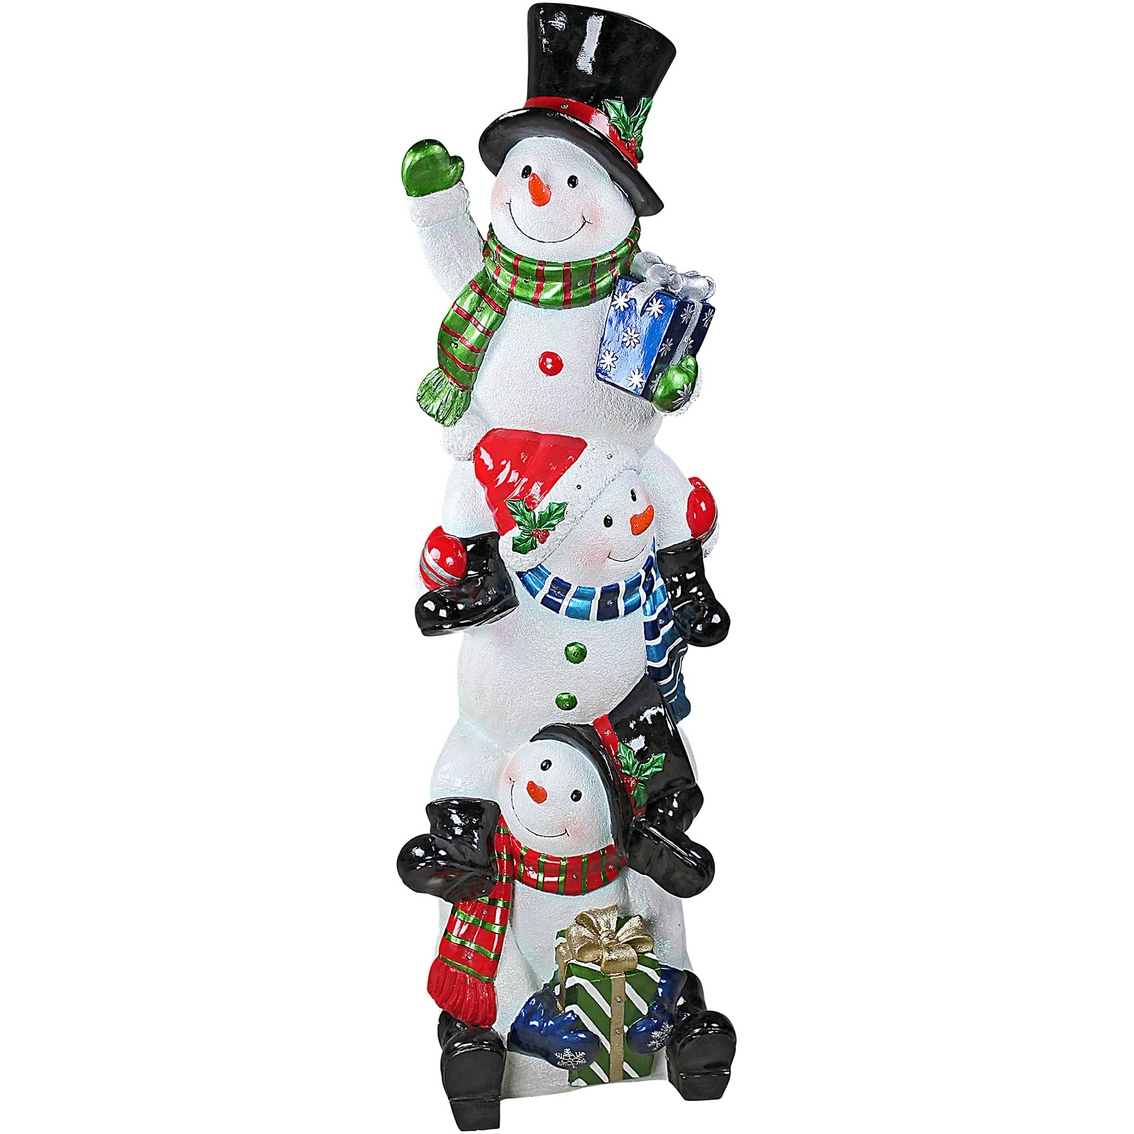 Christmas Statue Decorations: Design Toscano Snowbro Illuminated Snowman Holiday Statue